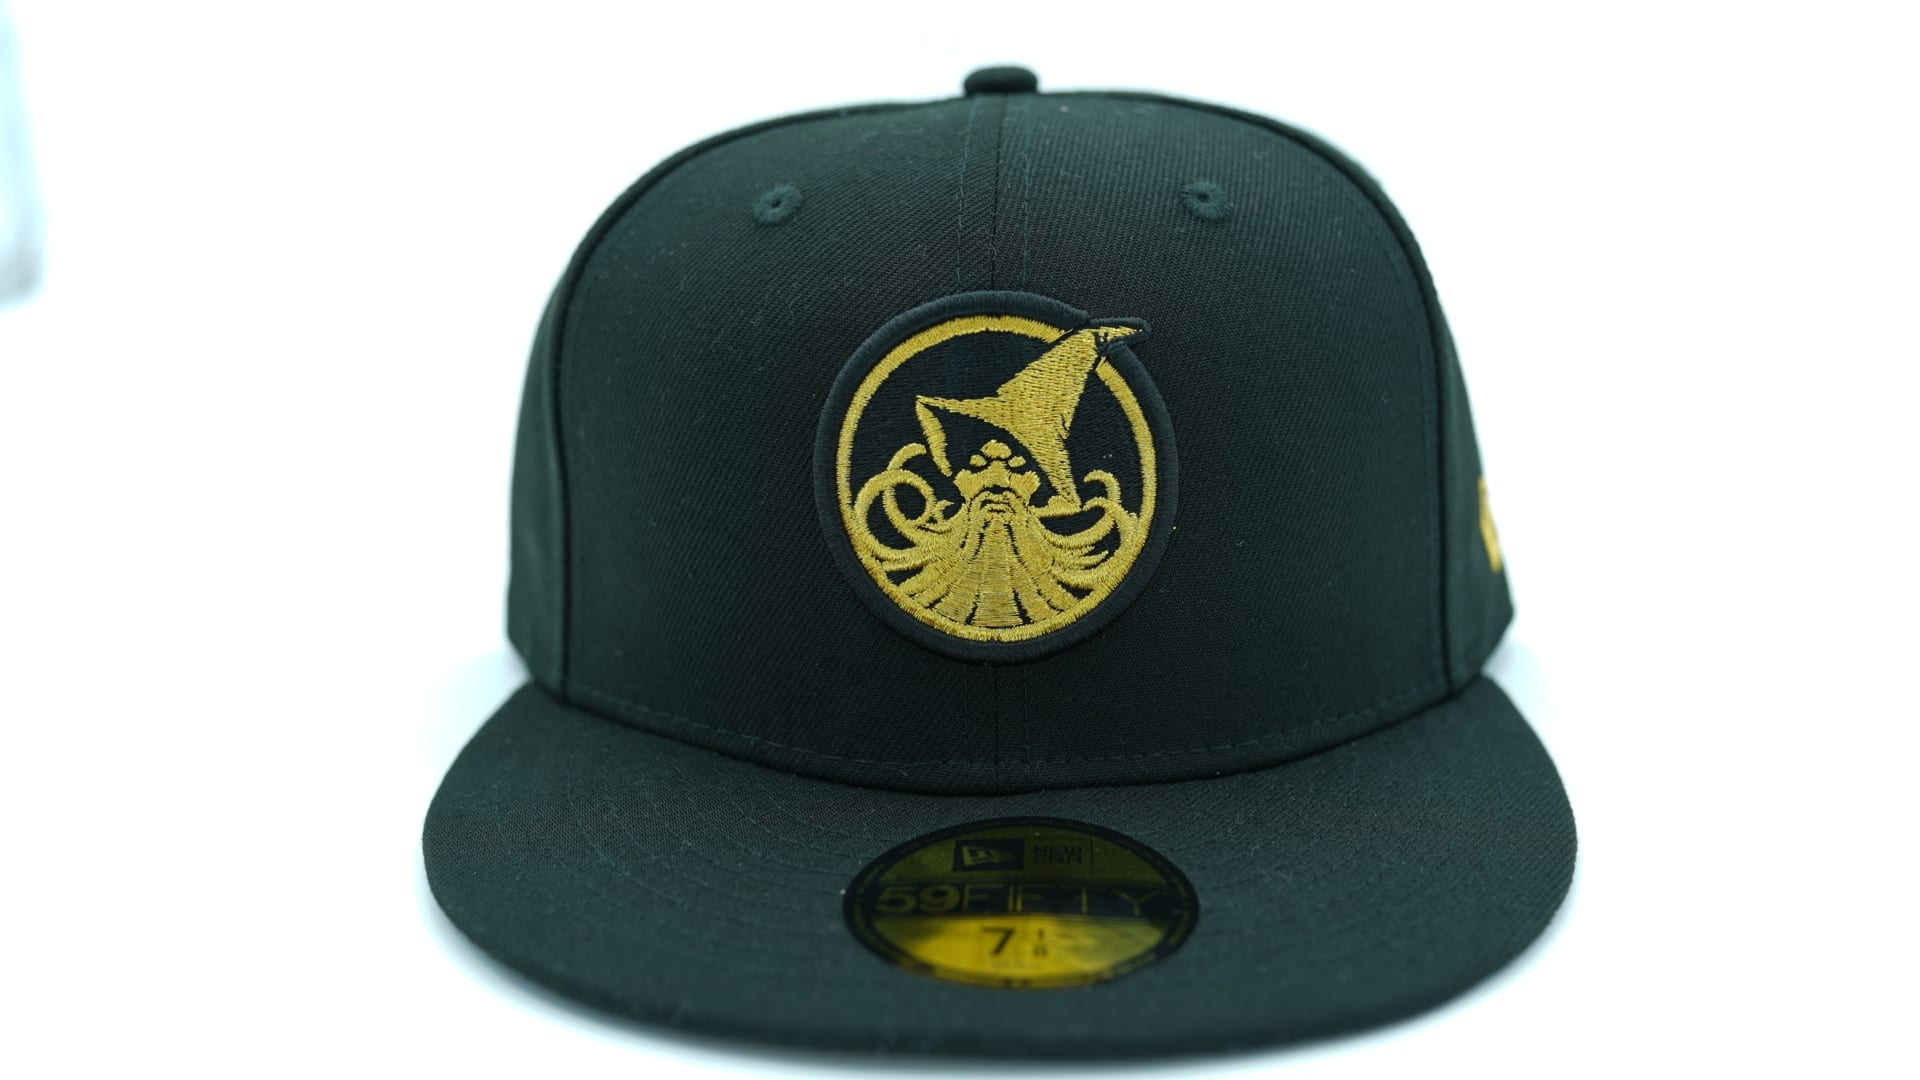 georgetown hoyas zwool fitted baseball cap zephyr ncaa